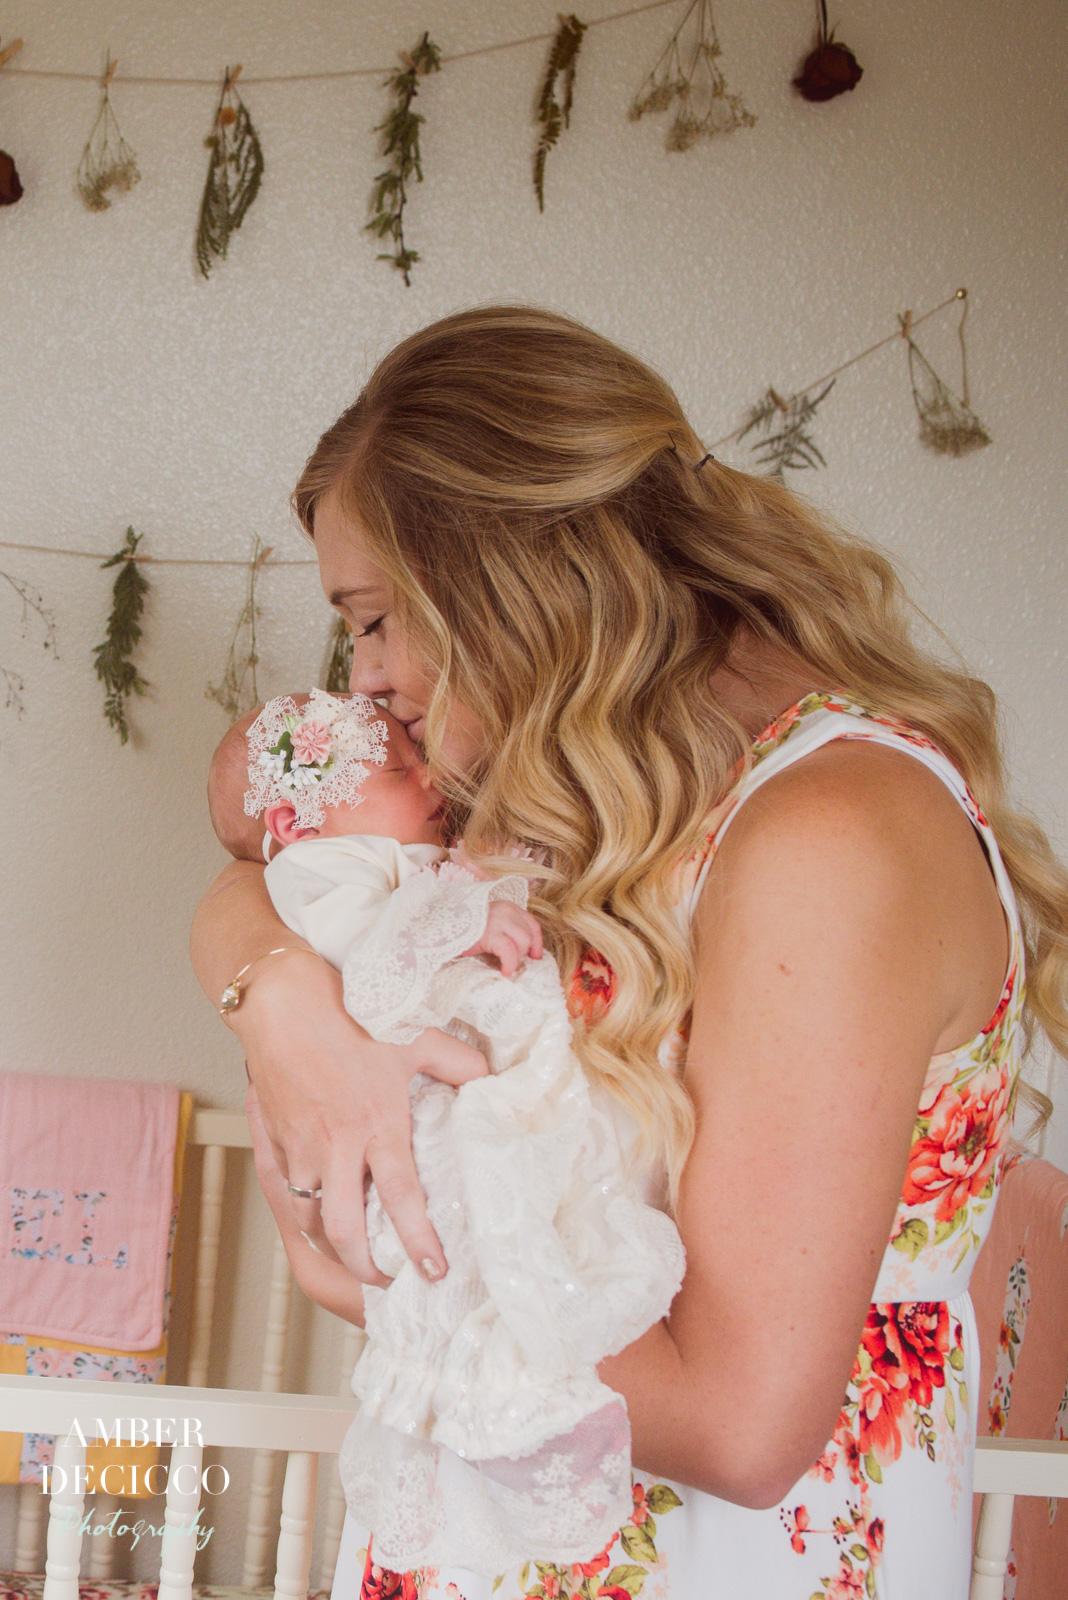 haizel-newborn-adeciccophoto-4708.jpg